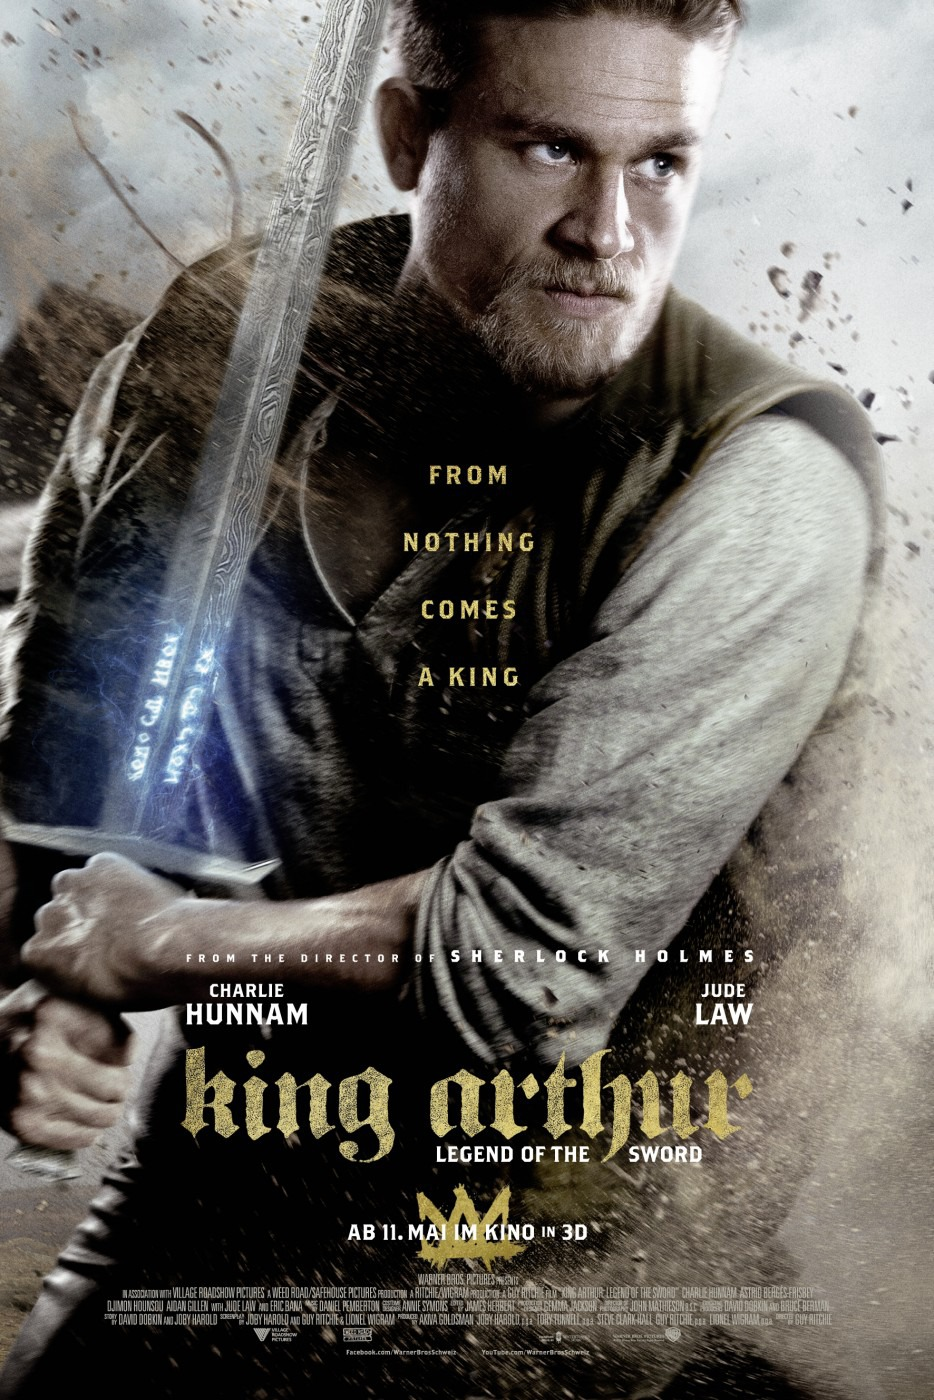 King Arthur Legend of the Sword (2017) HDRip  Full Movie Cover